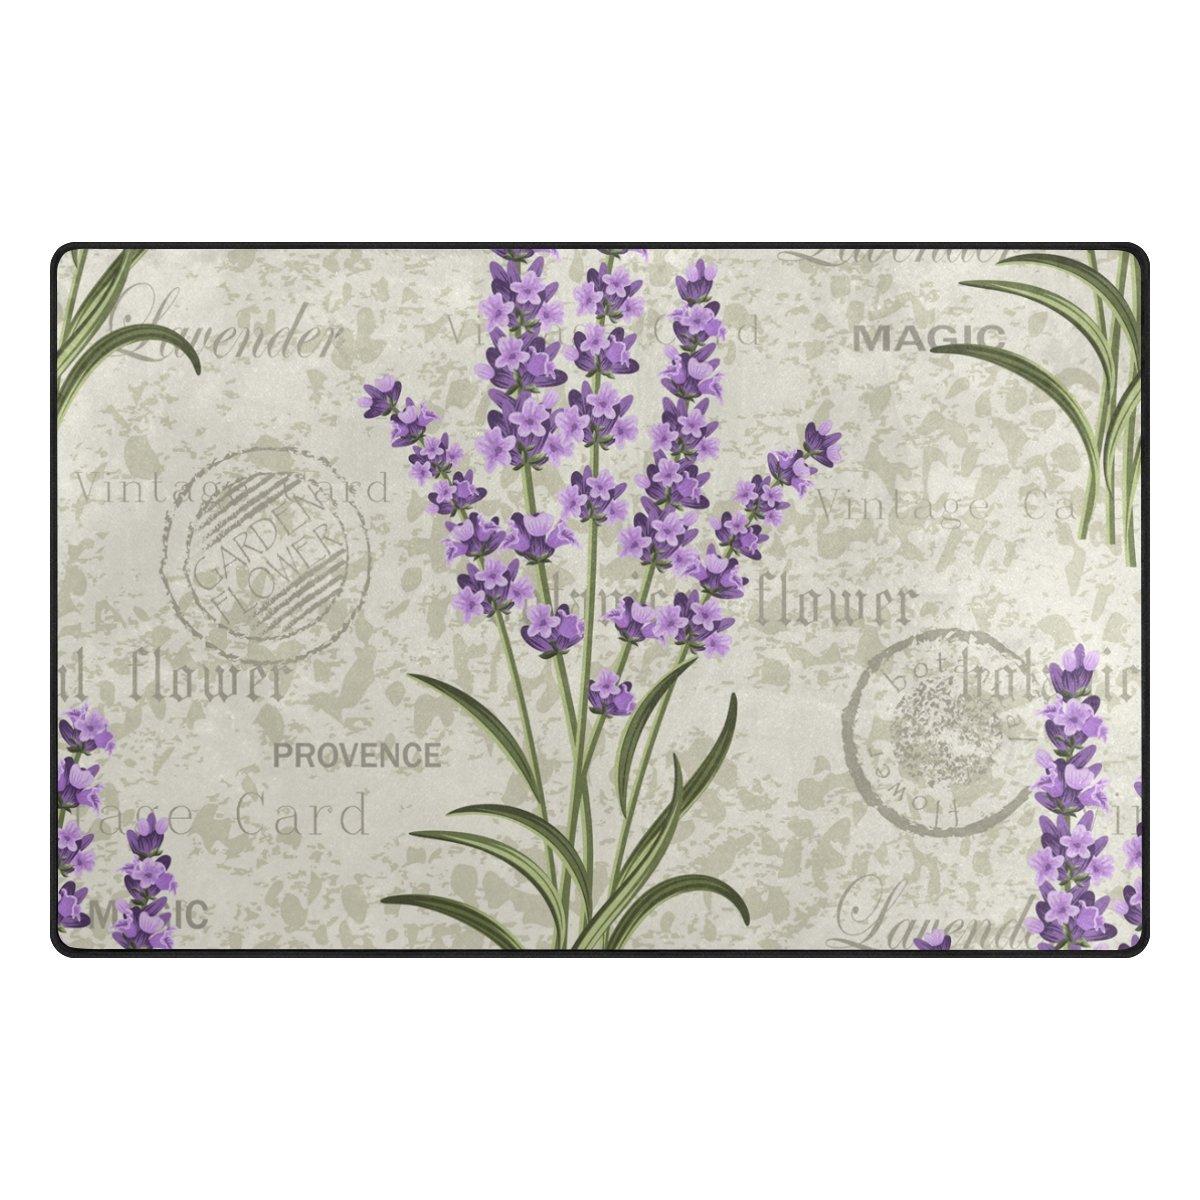 My Daily Lavenders Floral Vintage Area Rug 20'' x 31'', Door Mat for Living Room Bedroom Kitchen Bathroom Decorative Lightweight Foam Printed Rug